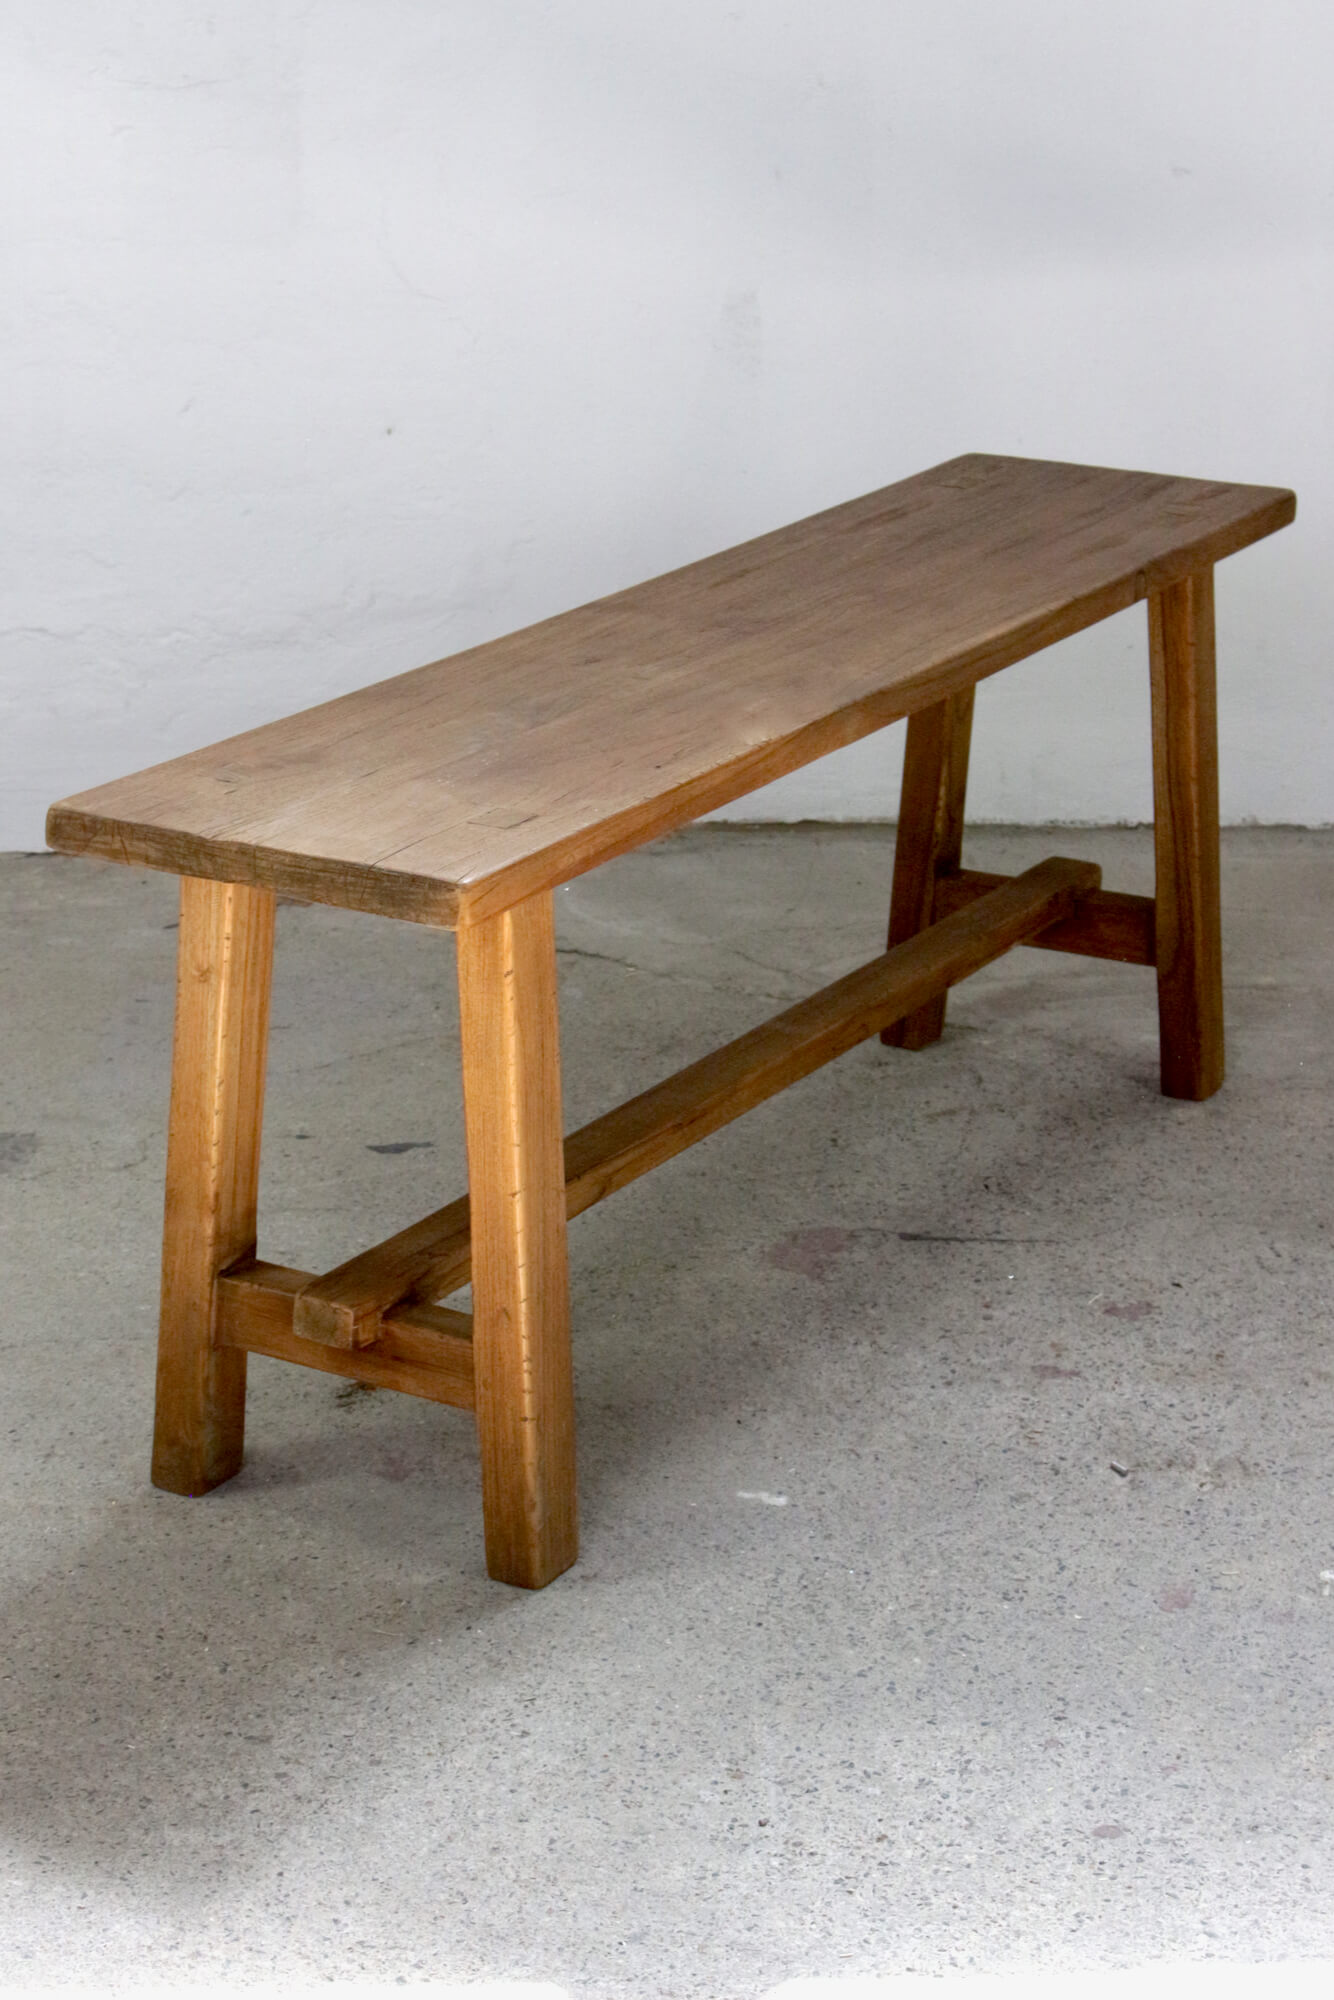 Holzbank Teakholz Handarbeit, 130 cm